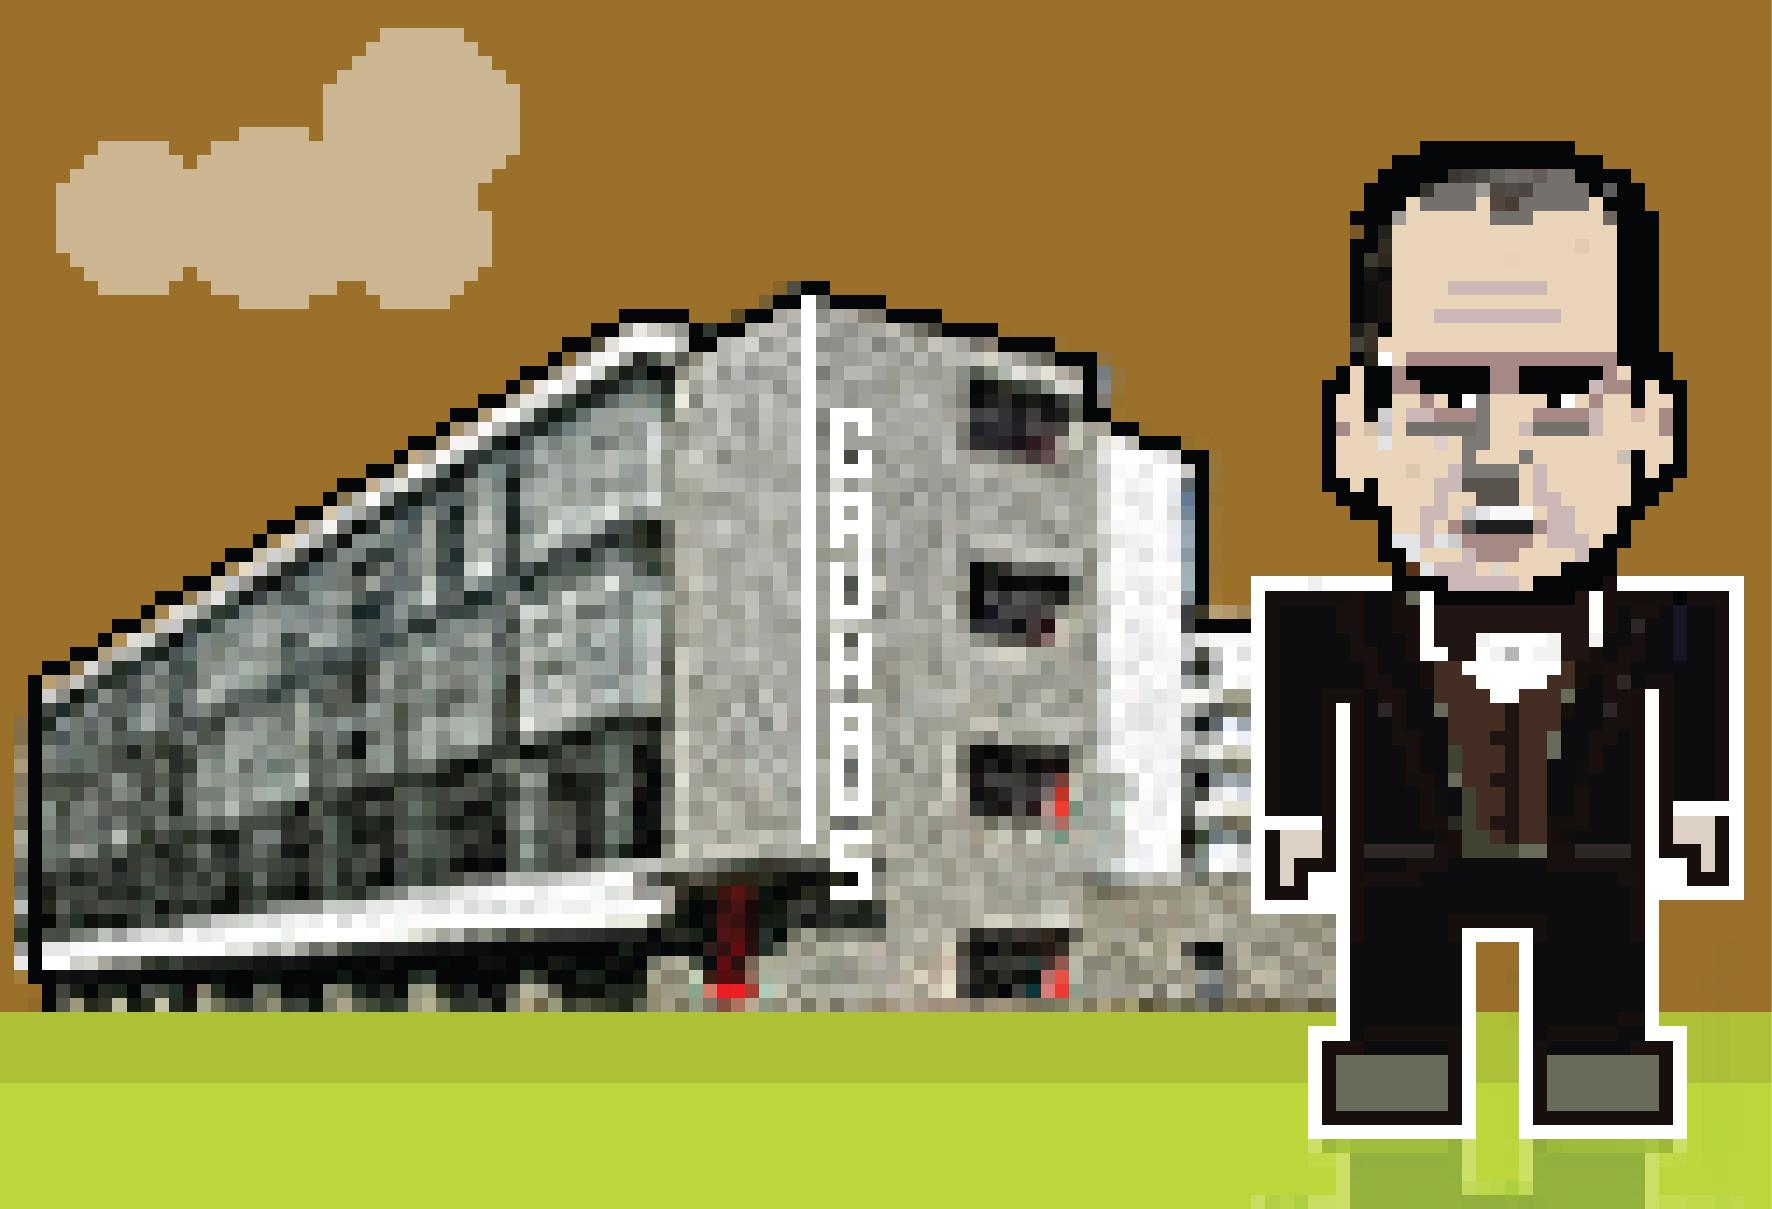 Dessau Bauhaus / Walter Gropius. Image Courtesy of Federico Babina